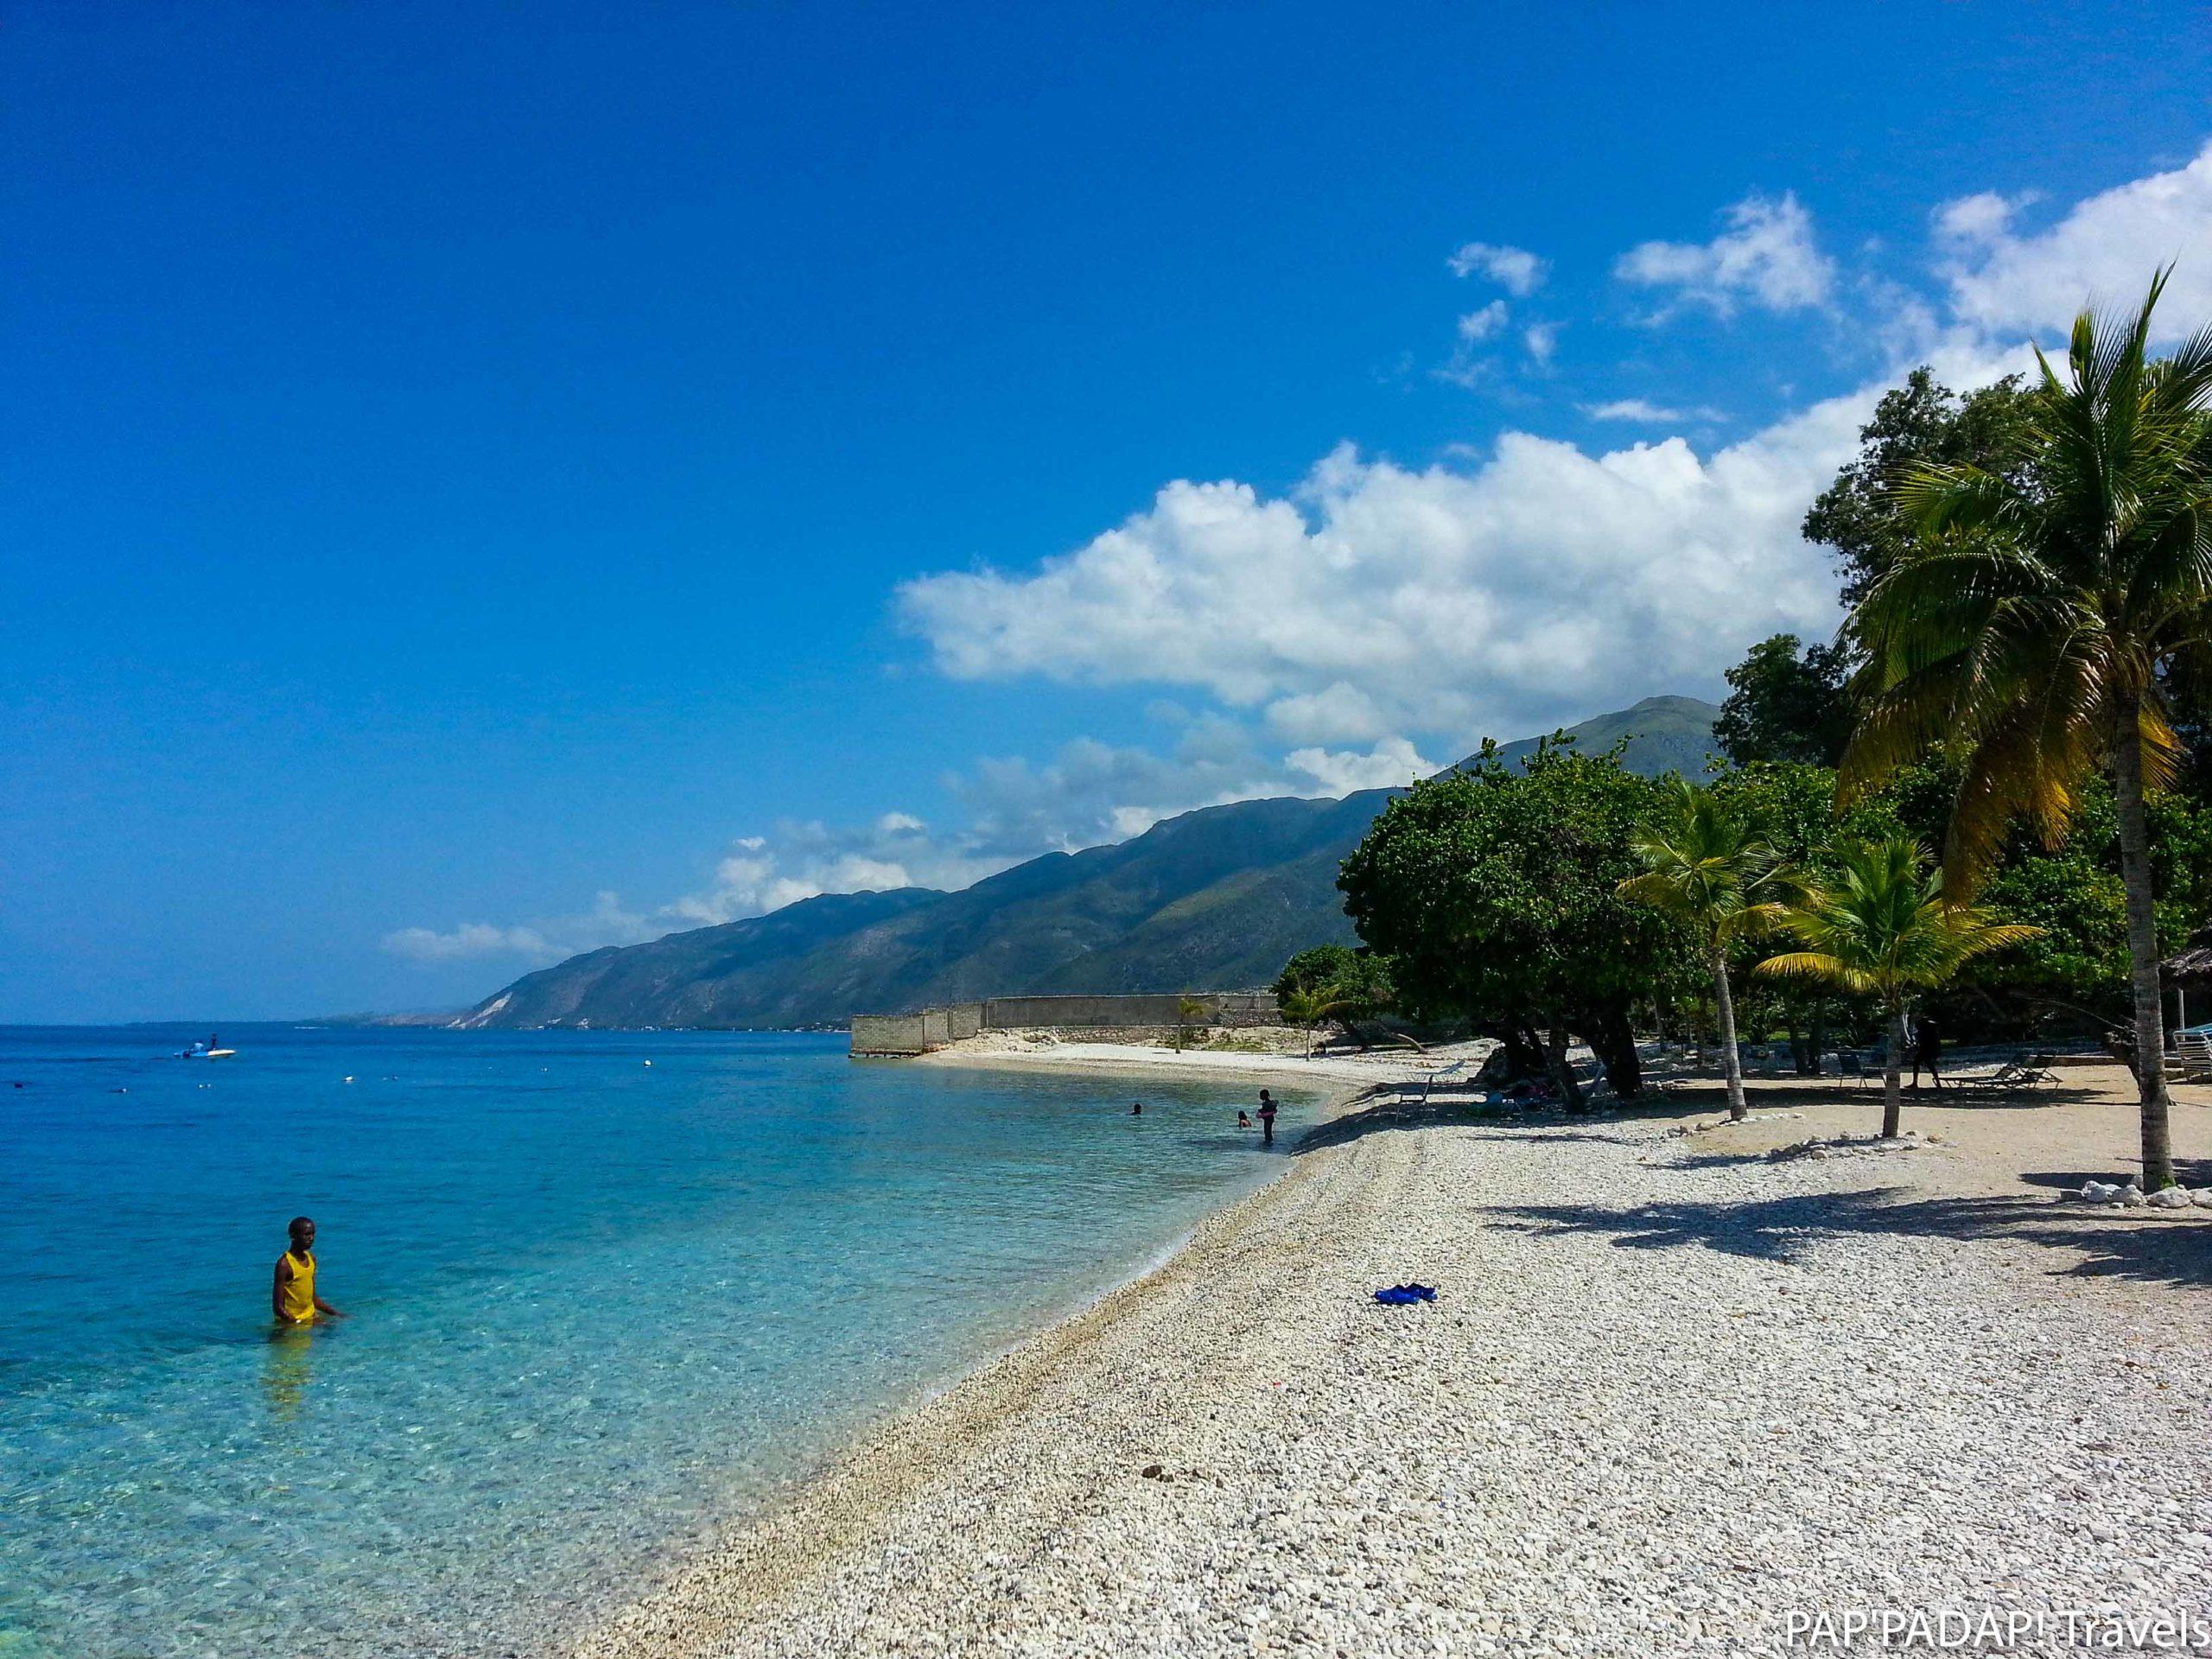 Plage Arcahaie palmiers - Haïti - PAP_PADAP! Travels